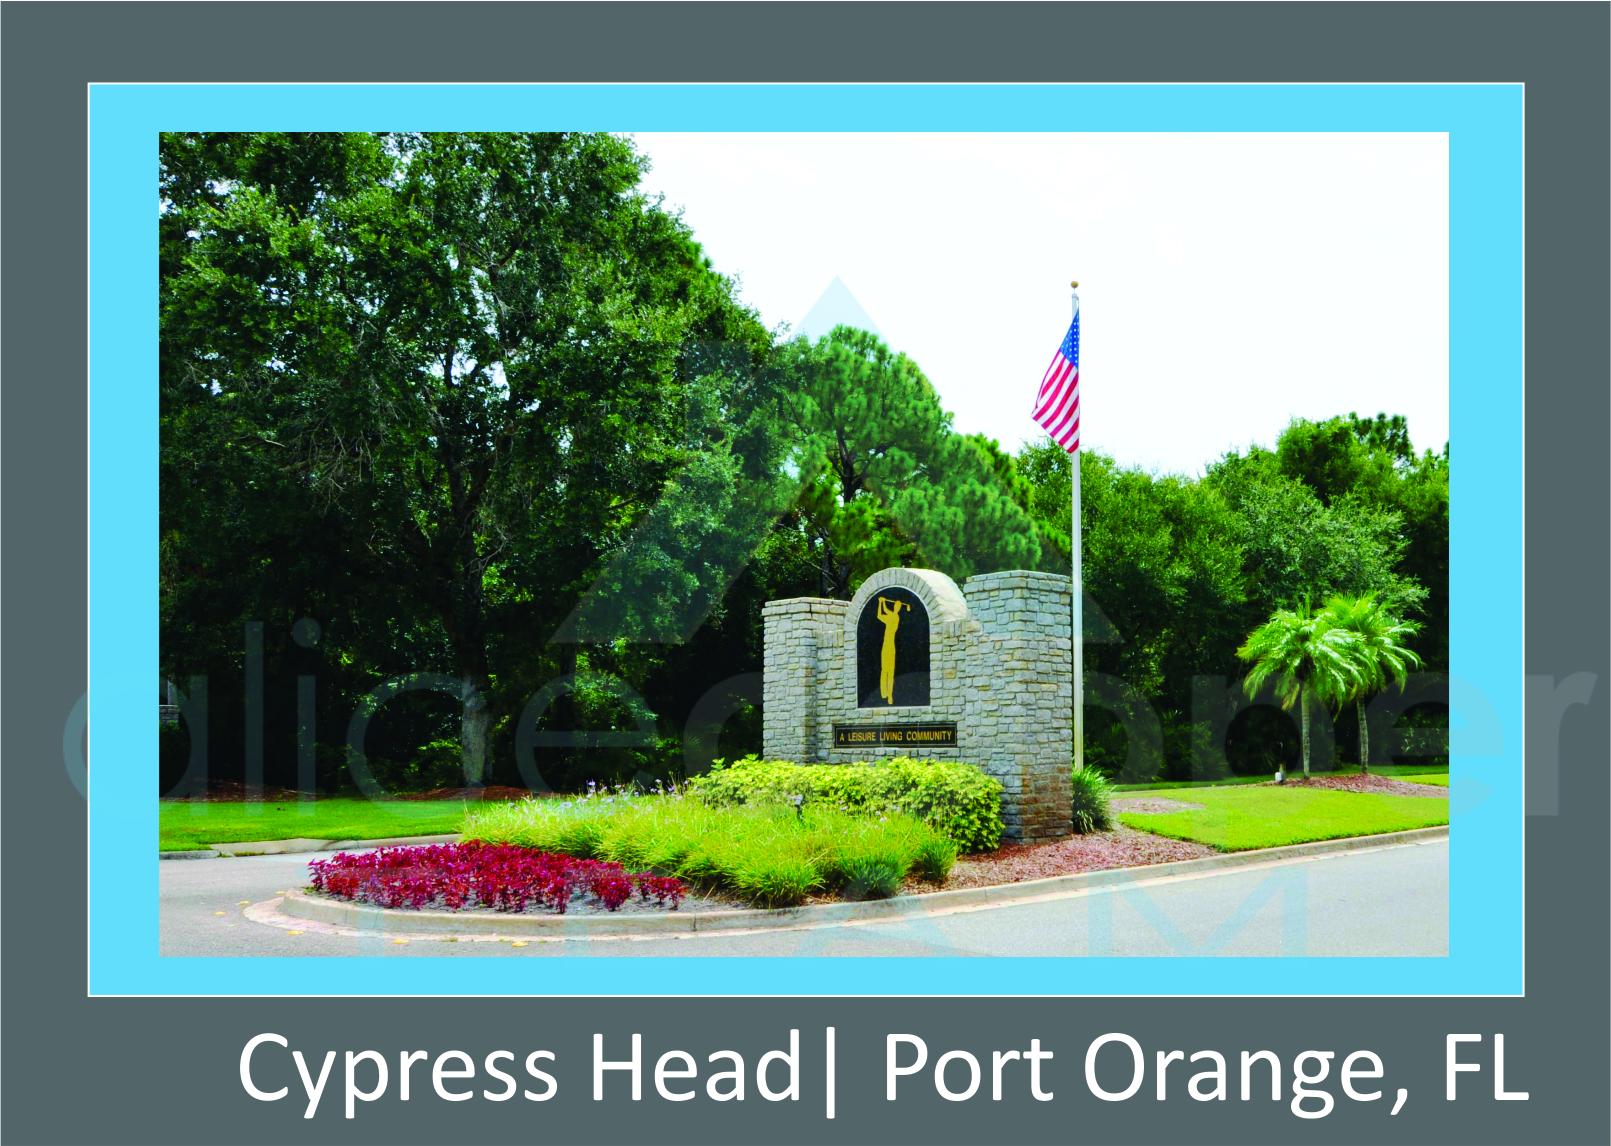 Cypress Head Neighborhood Entrance Sign